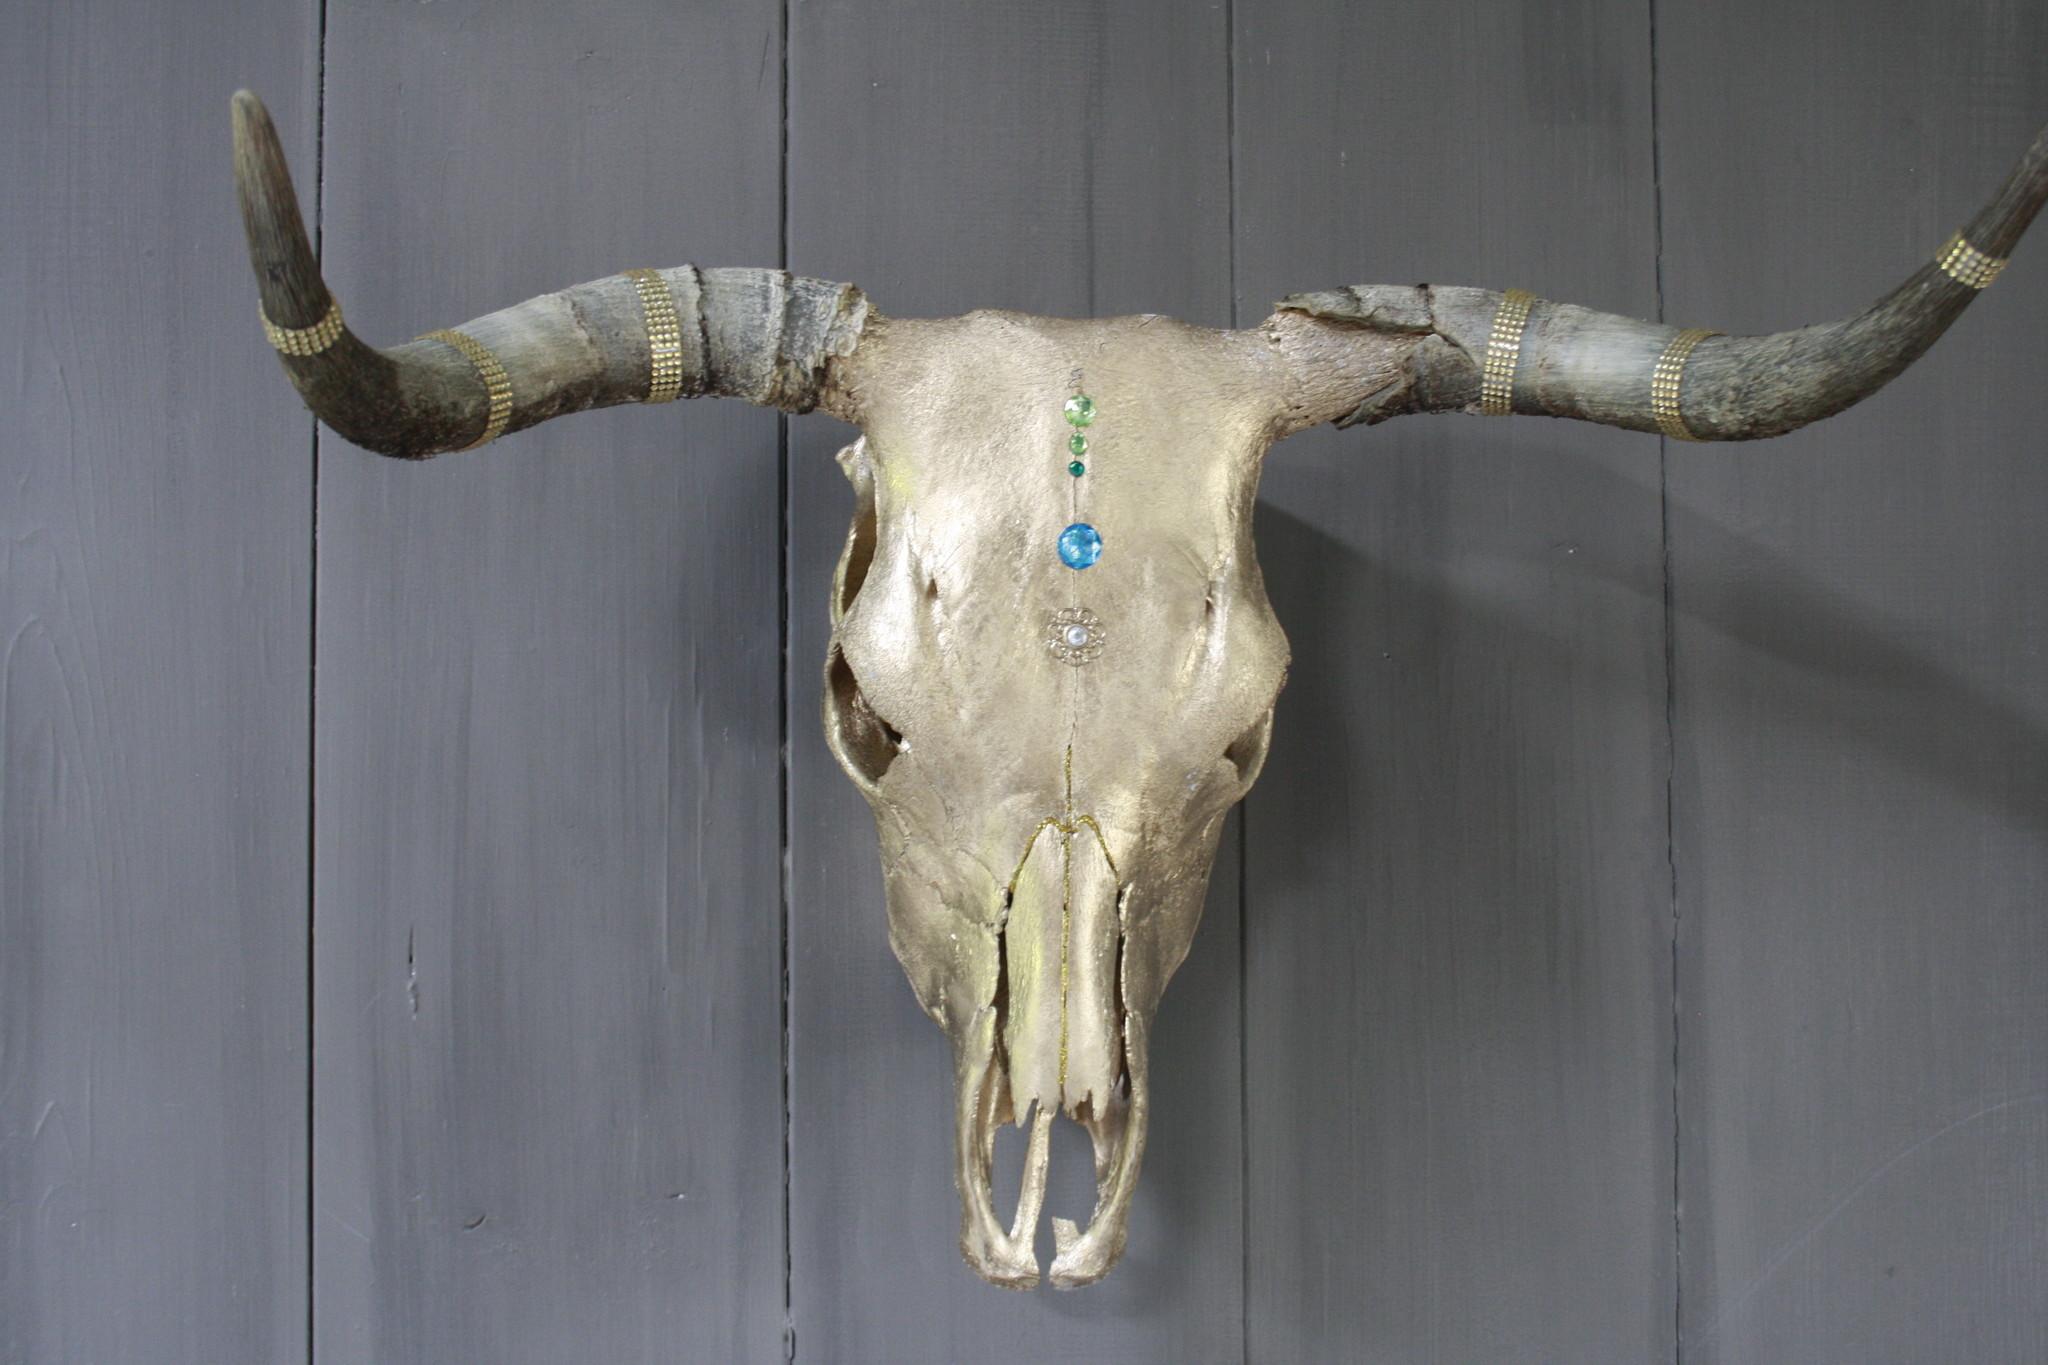 Longhorn Schedel Goud Met Hoorns 63 x 44 cm - Copy-1